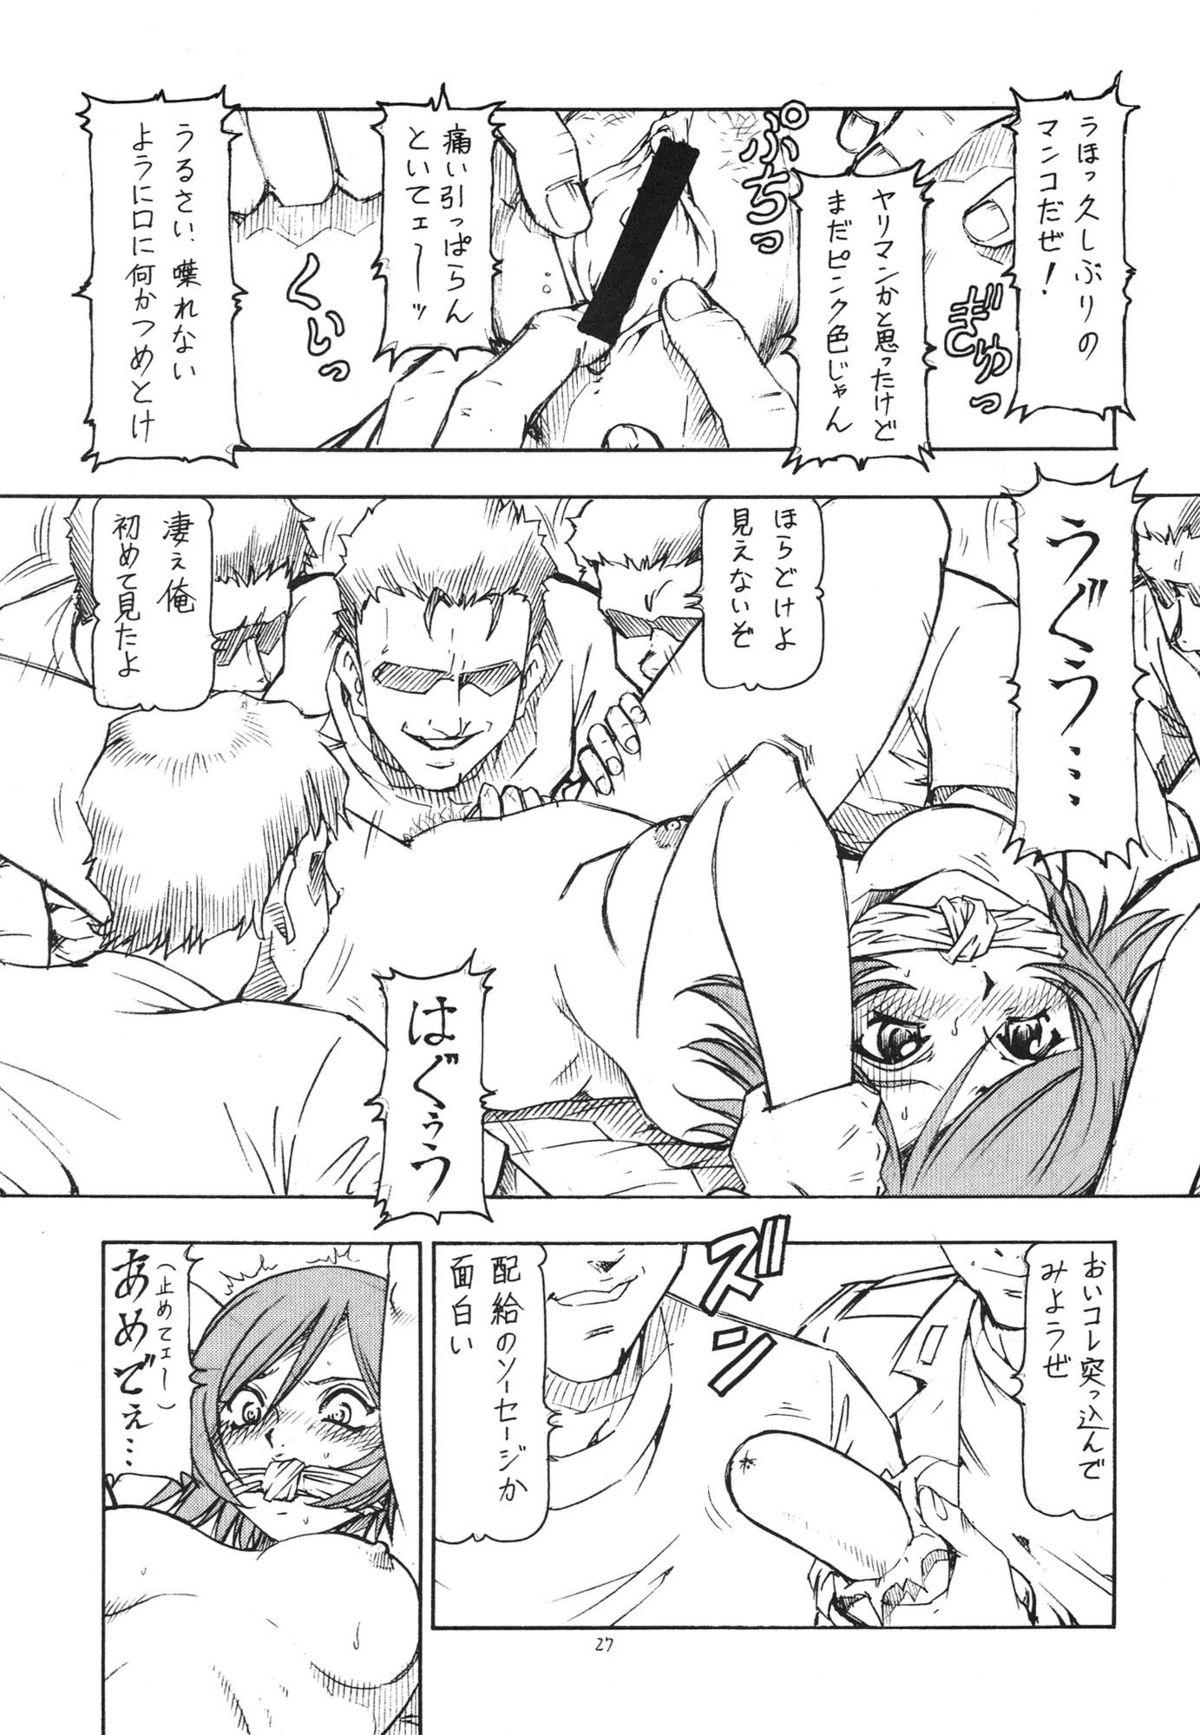 GPM.XXX Animation Moegiiro no Namida - Tear Drops 28